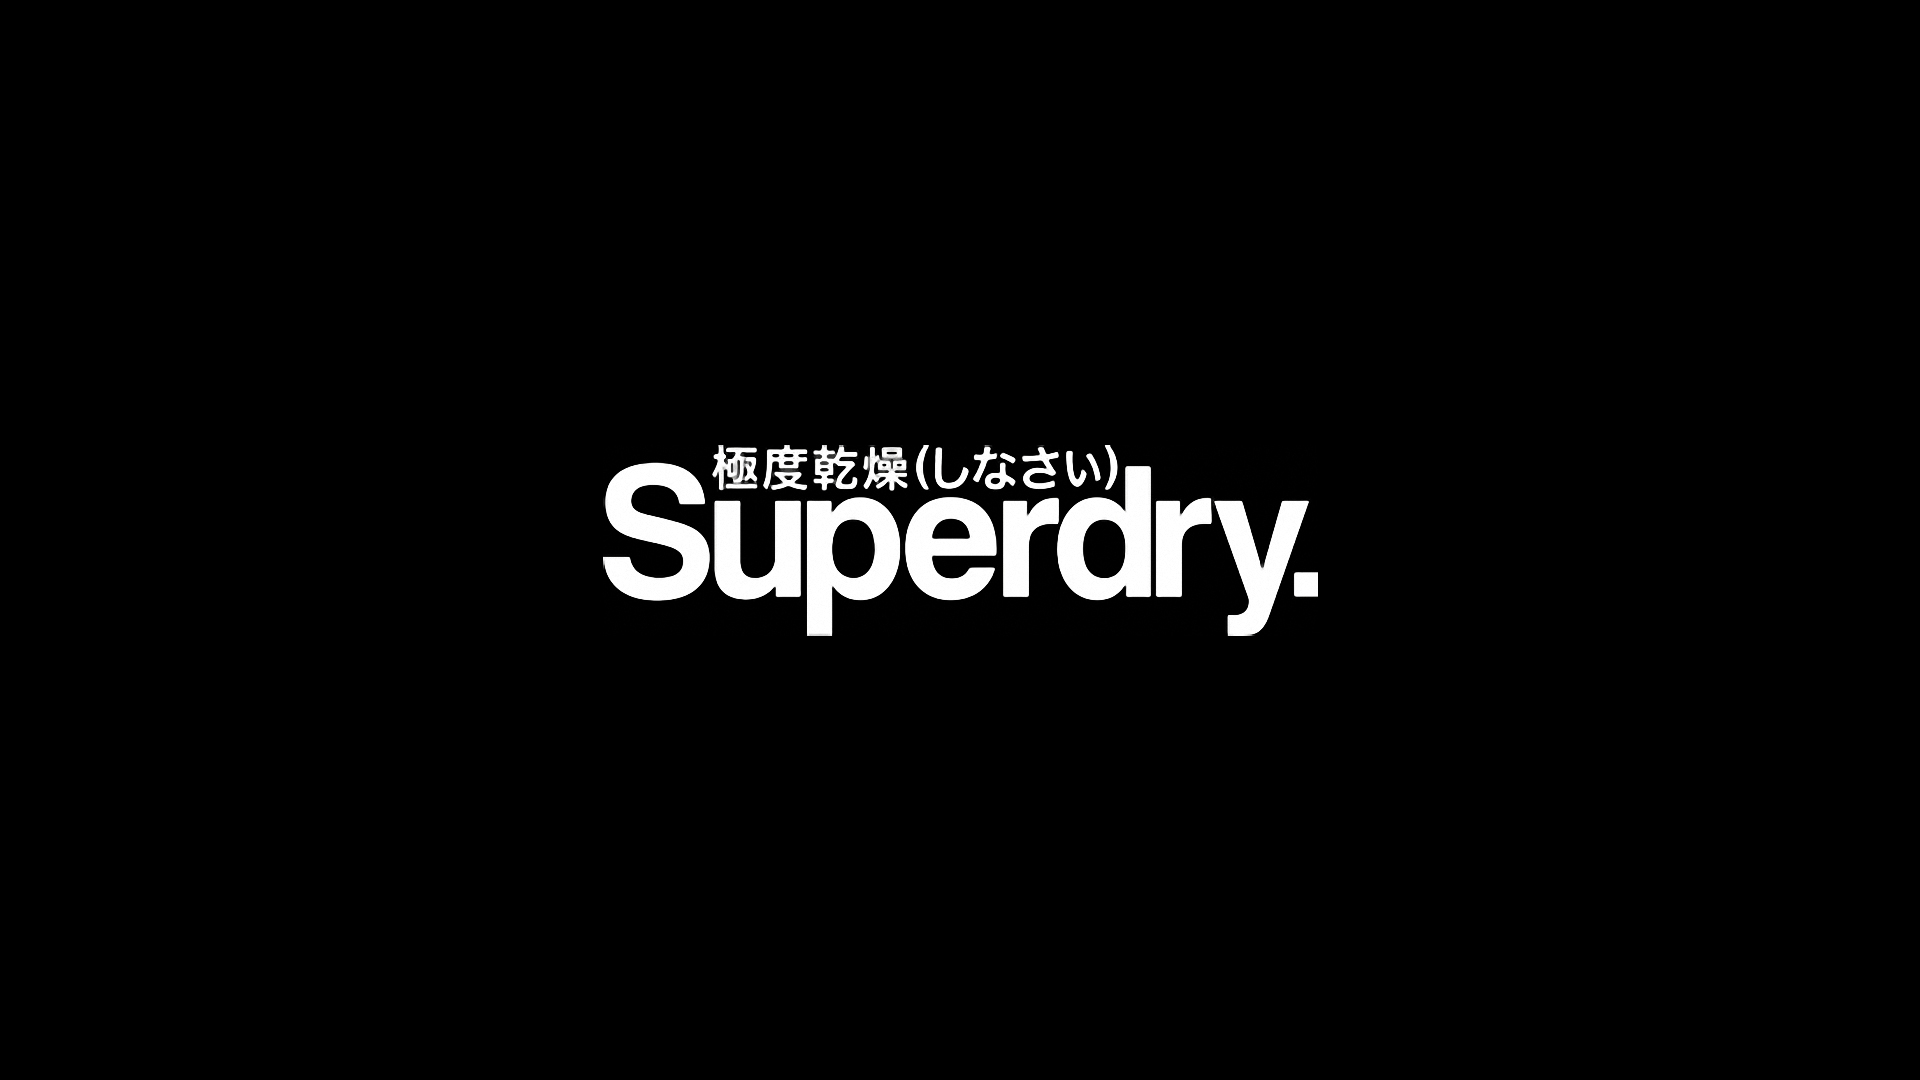 Iphone Plus Wallpaper Bargain Of The Week Superdry Ebay Outlet Uk Shopandbox